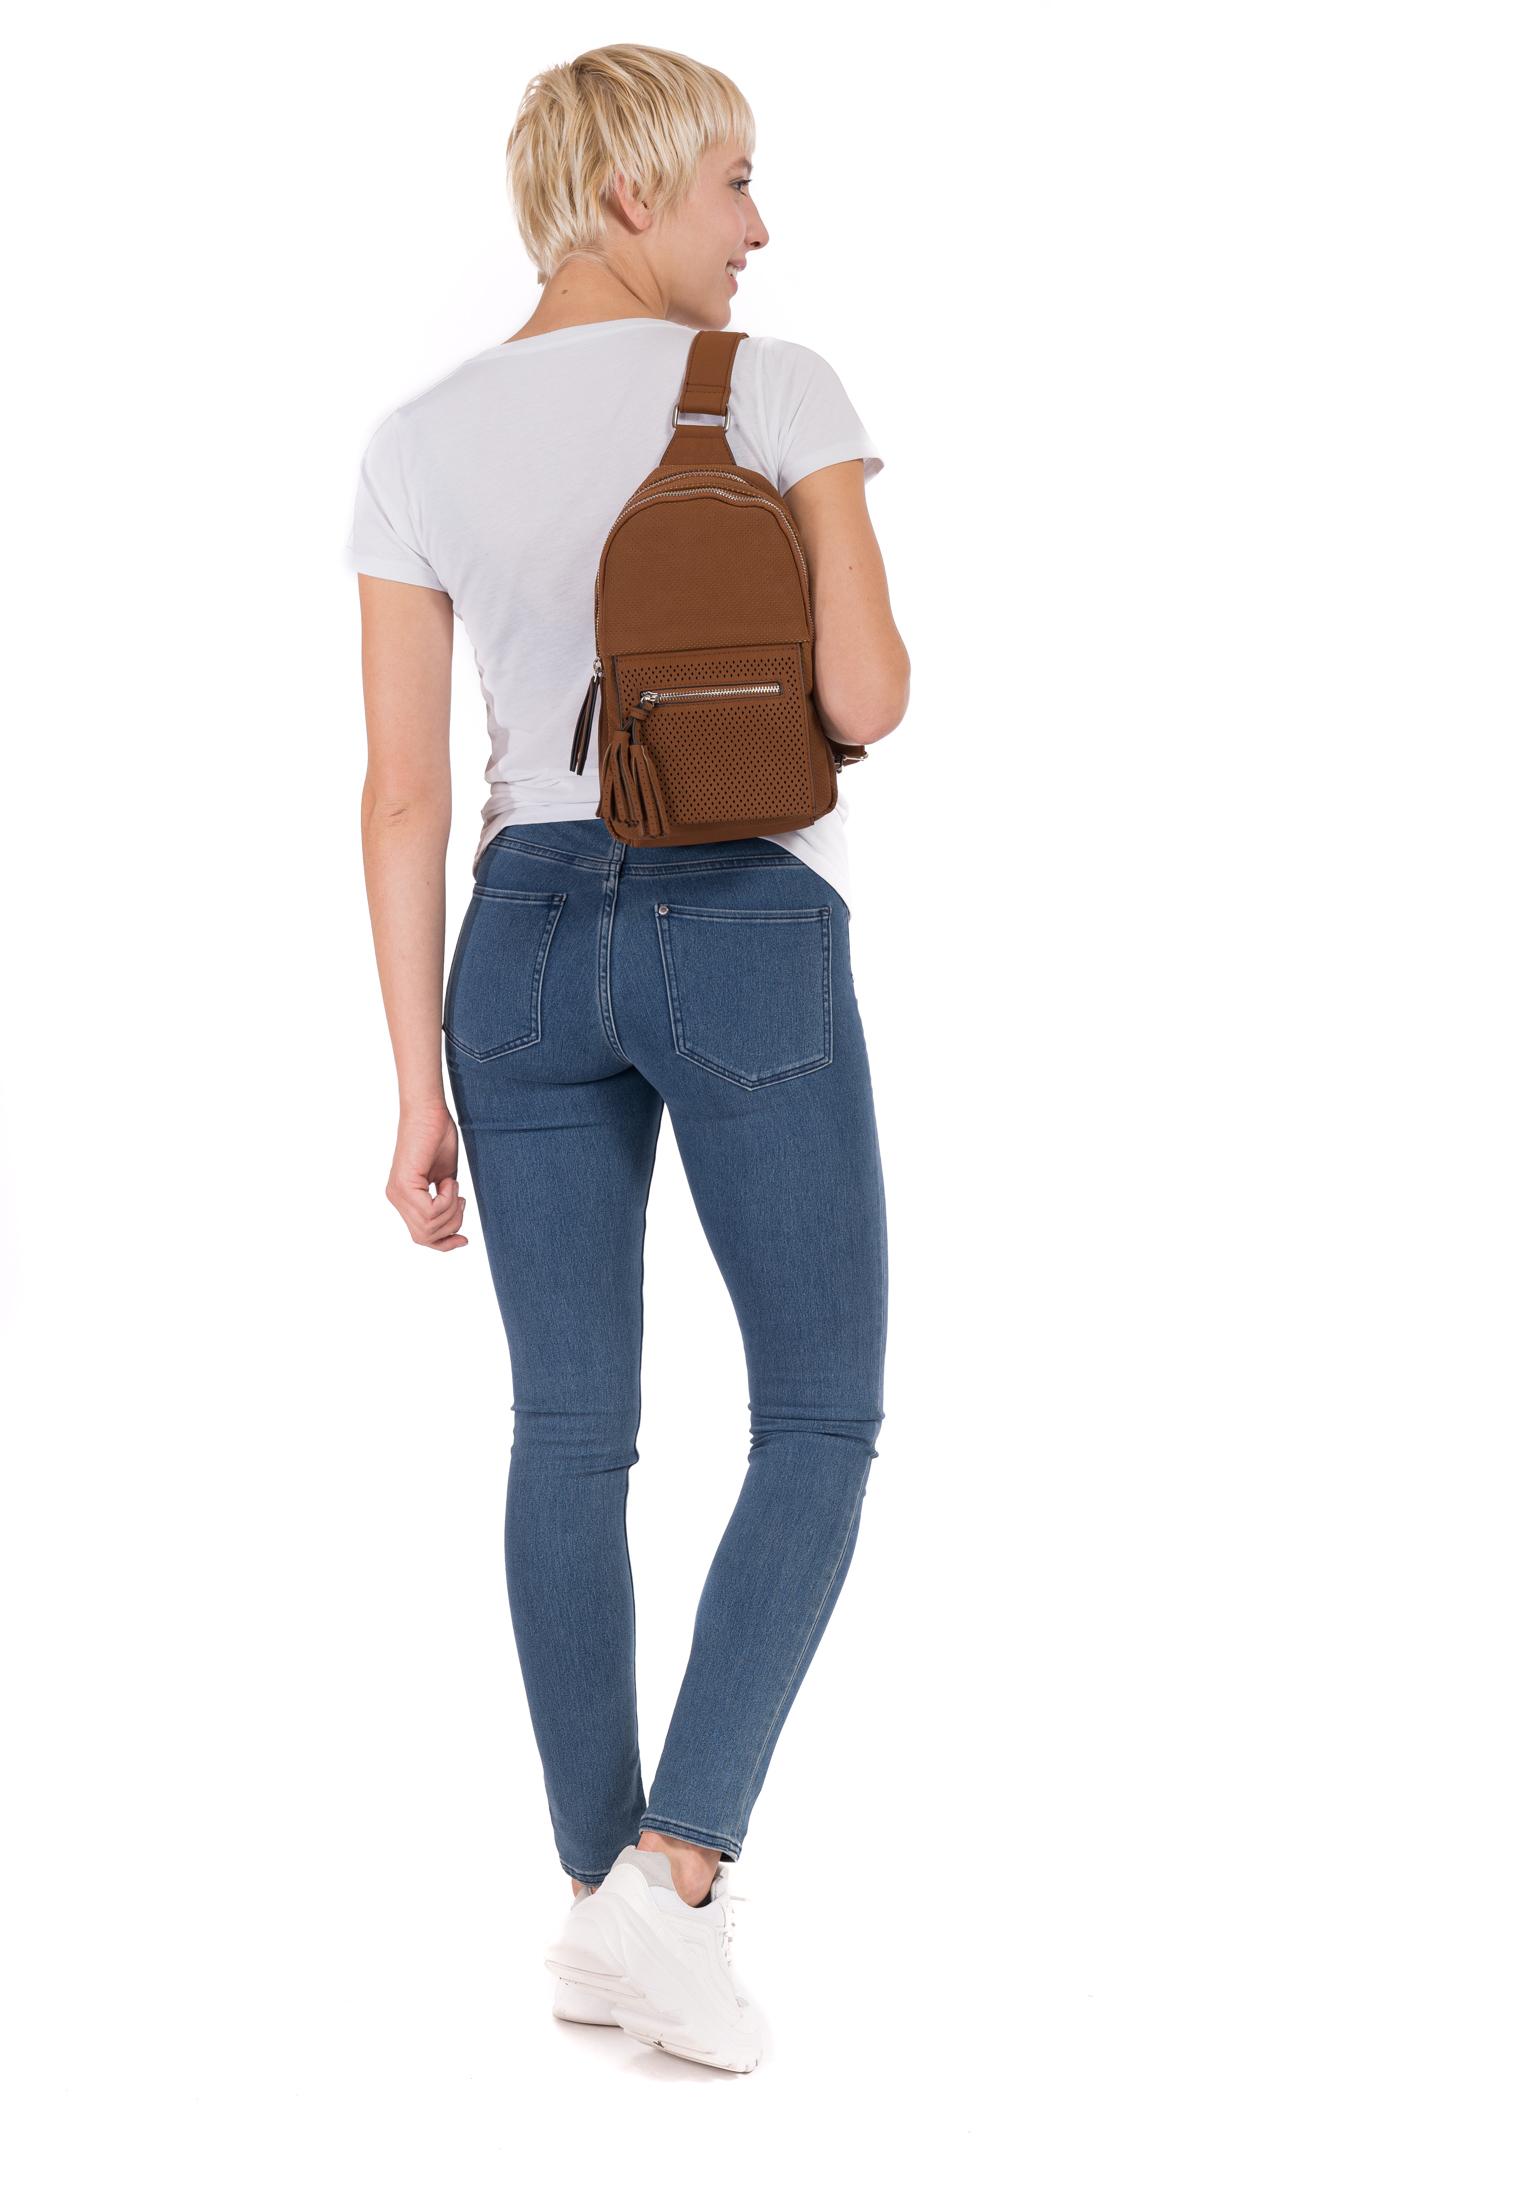 Bodybag Romy Ailey